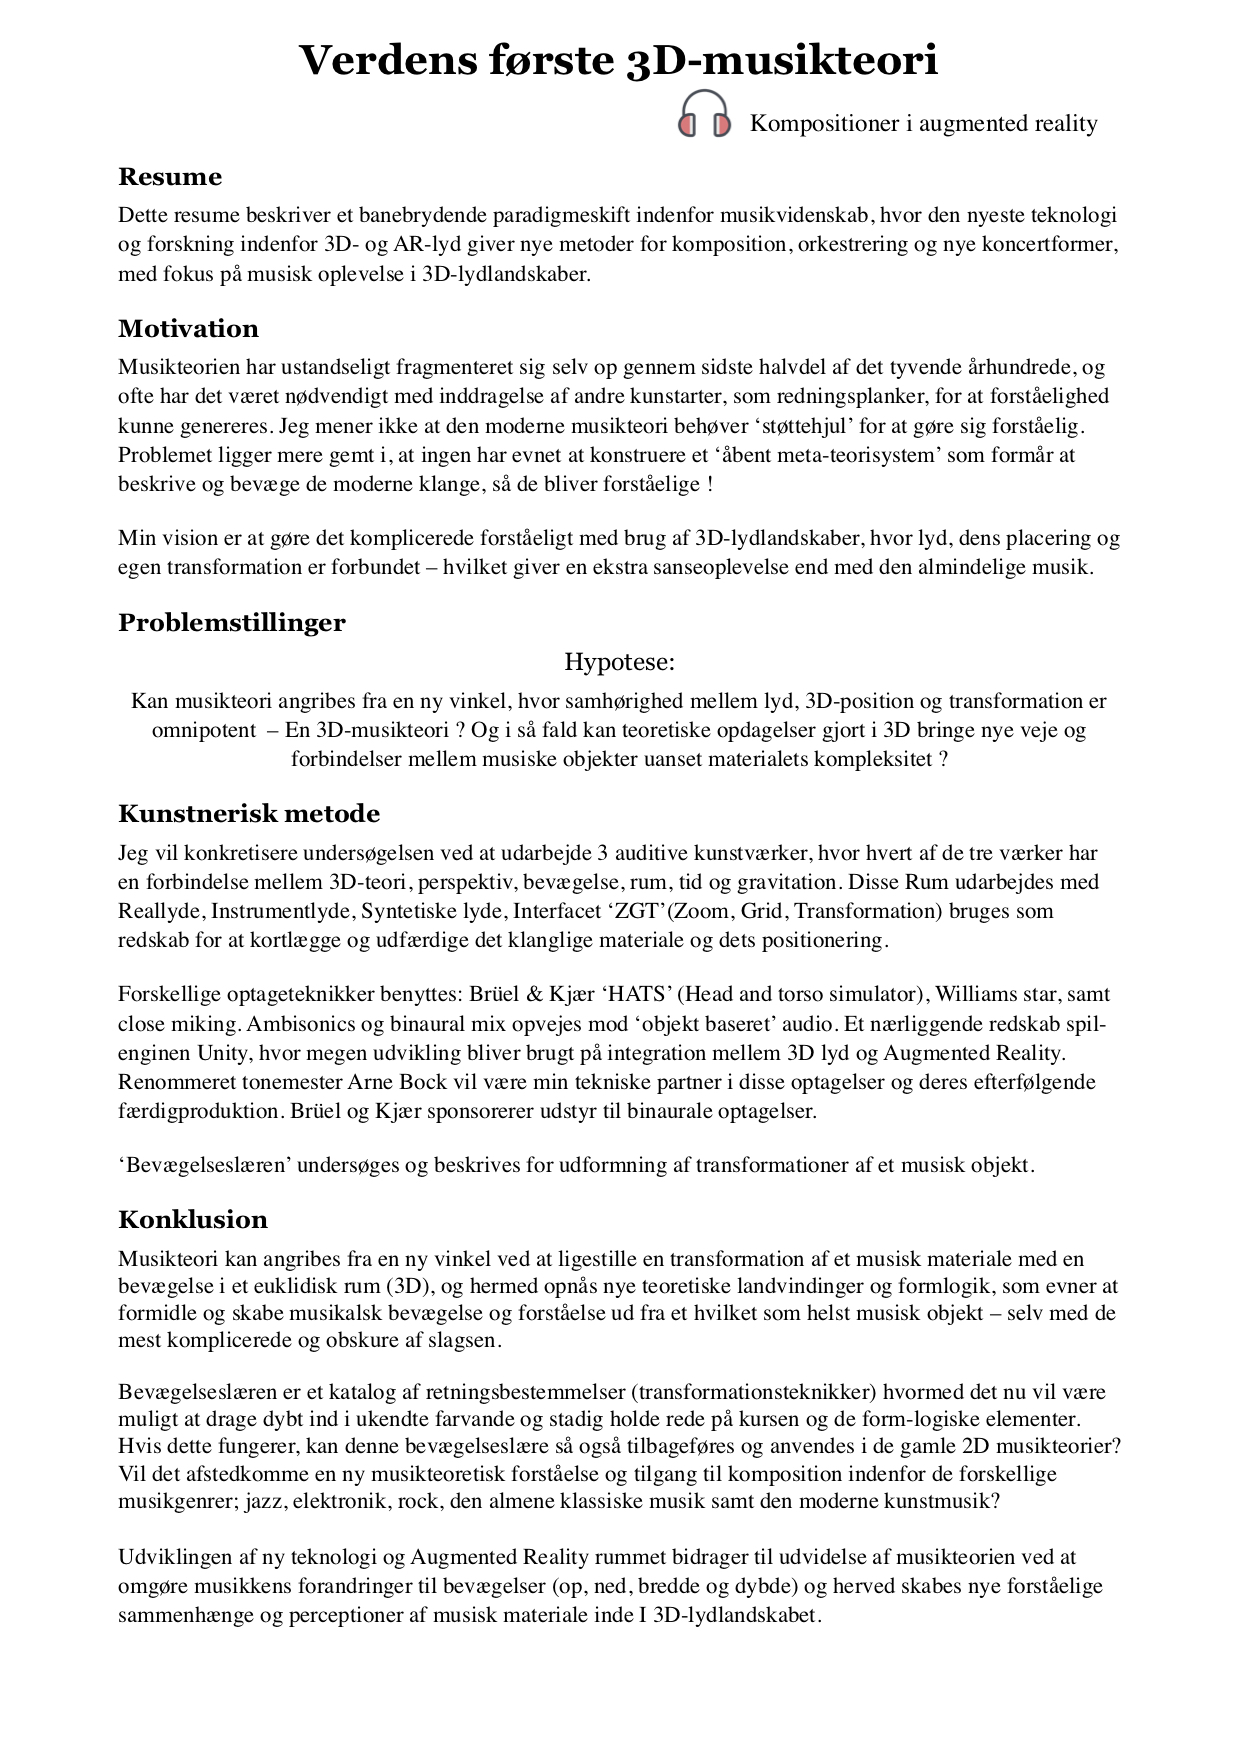 Résume PhD_JMK 2020_2